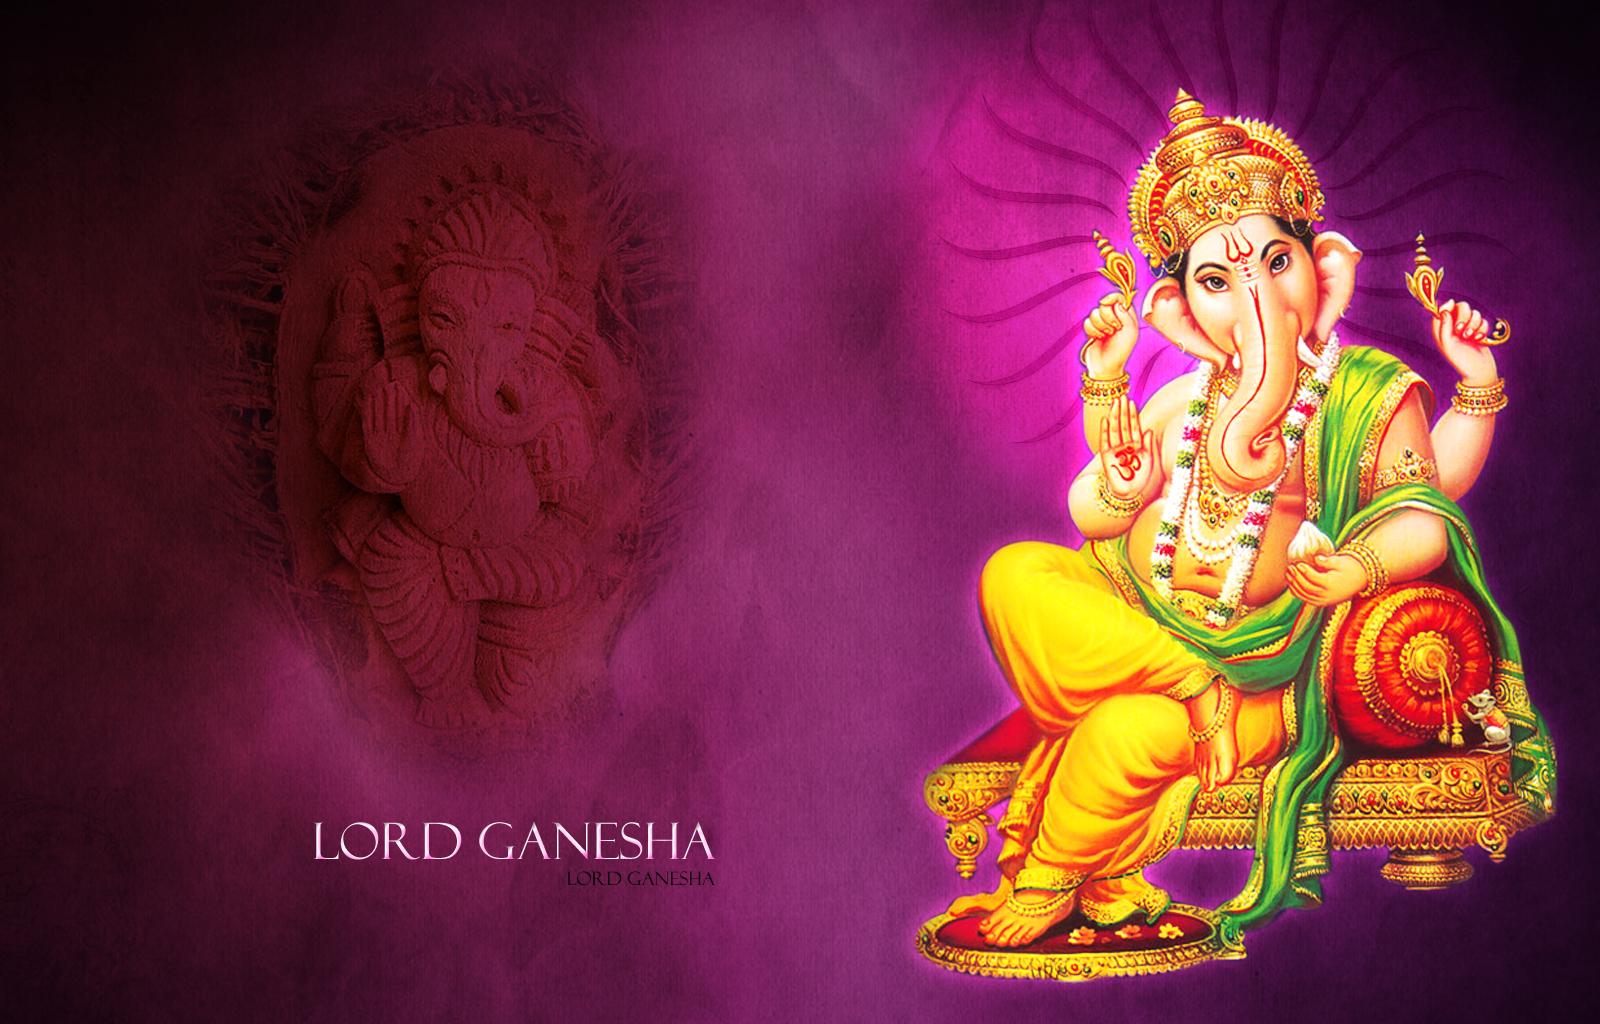 http://2.bp.blogspot.com/-EjkJwMCw5TE/USyQCEeJQPI/AAAAAAAAHEw/SvZbFbFL9vA/s1600/Lord-Ganesha-2192.jpg